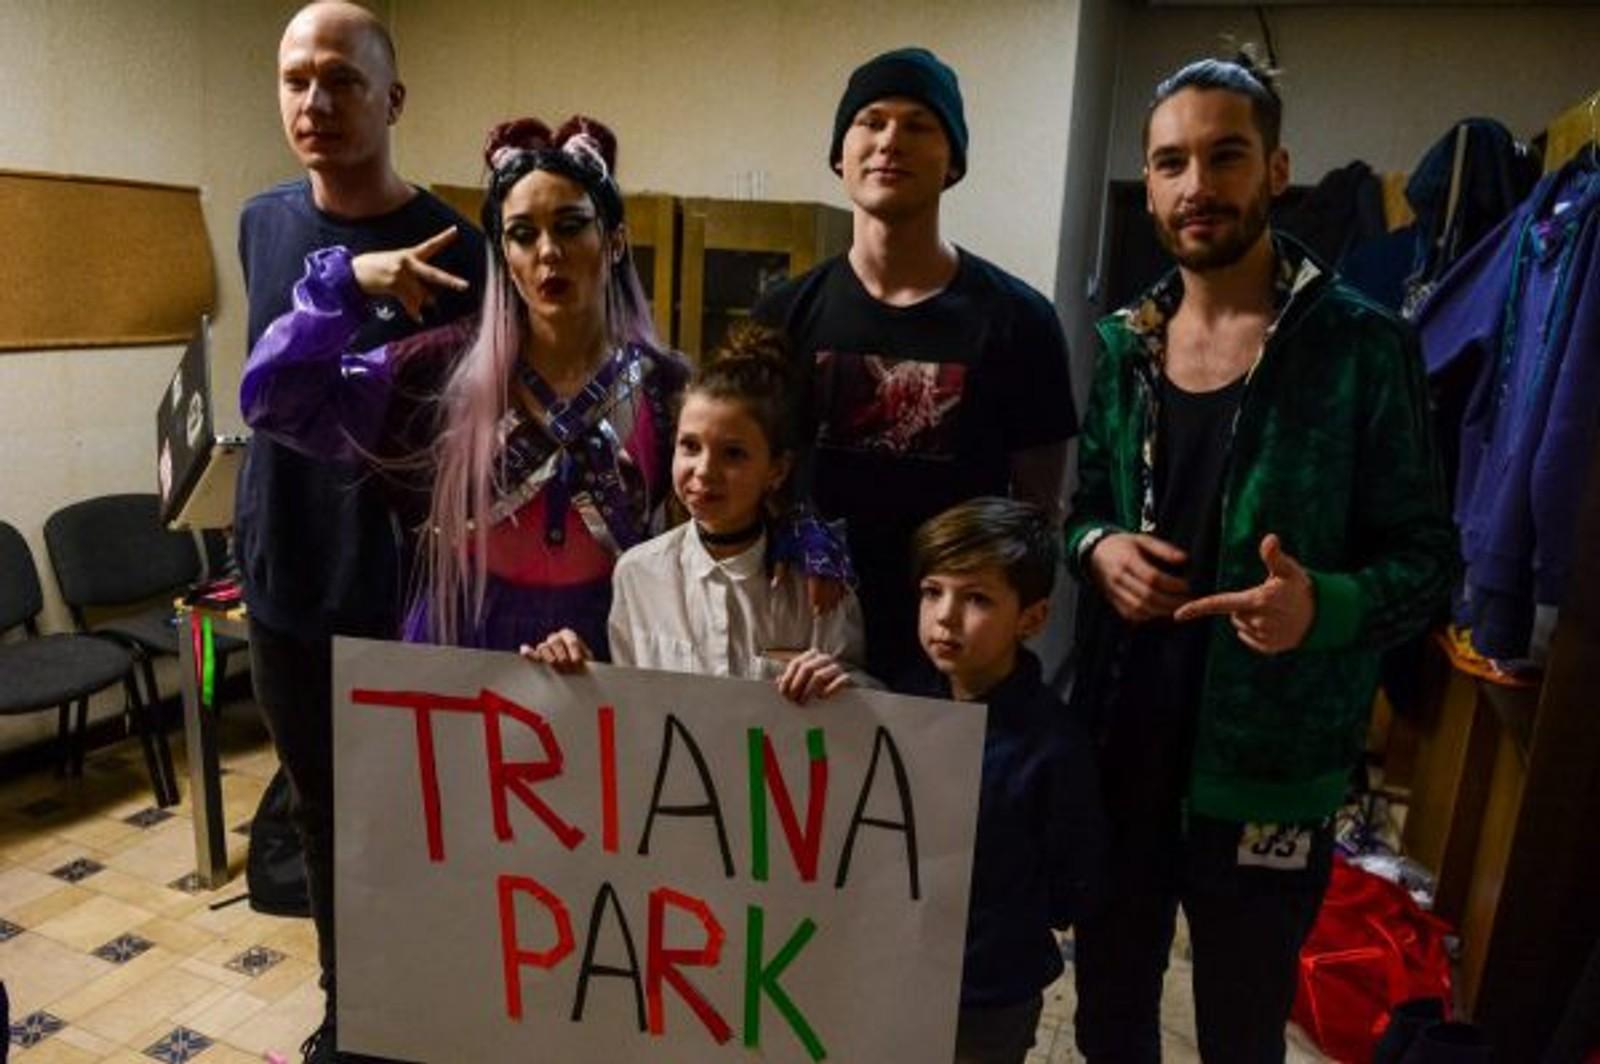 LATVIA: Triana Park (med fans)